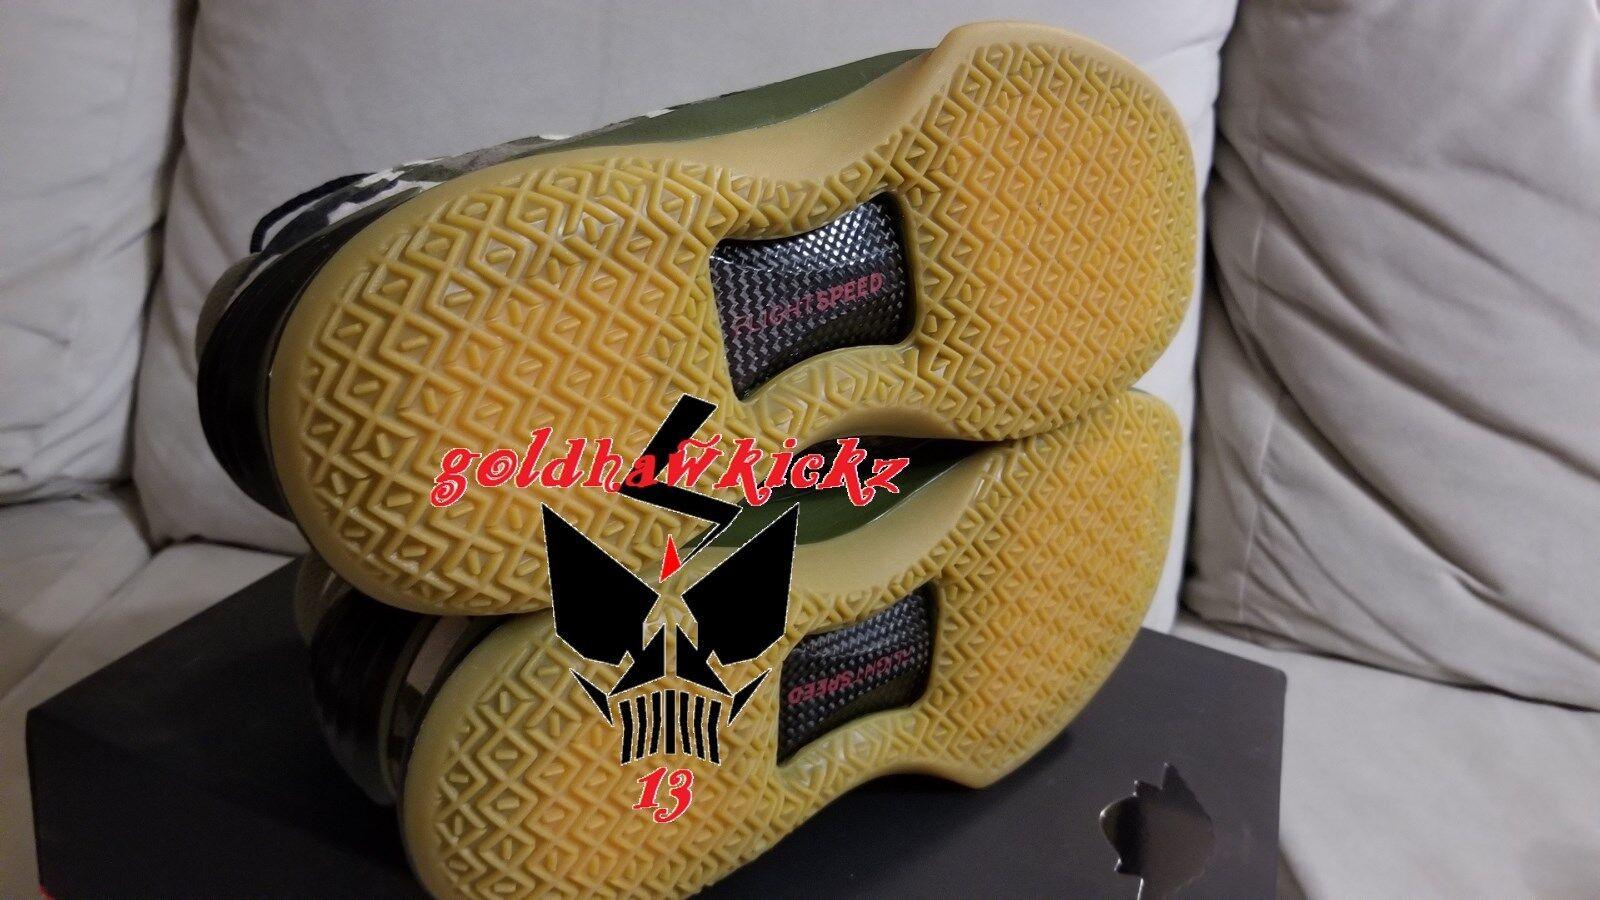 Nike Air Jordan XXXII 32 PE VETERANS DAY DAY DAY AA1253 200 schwarz desert camo unreleased 01d360